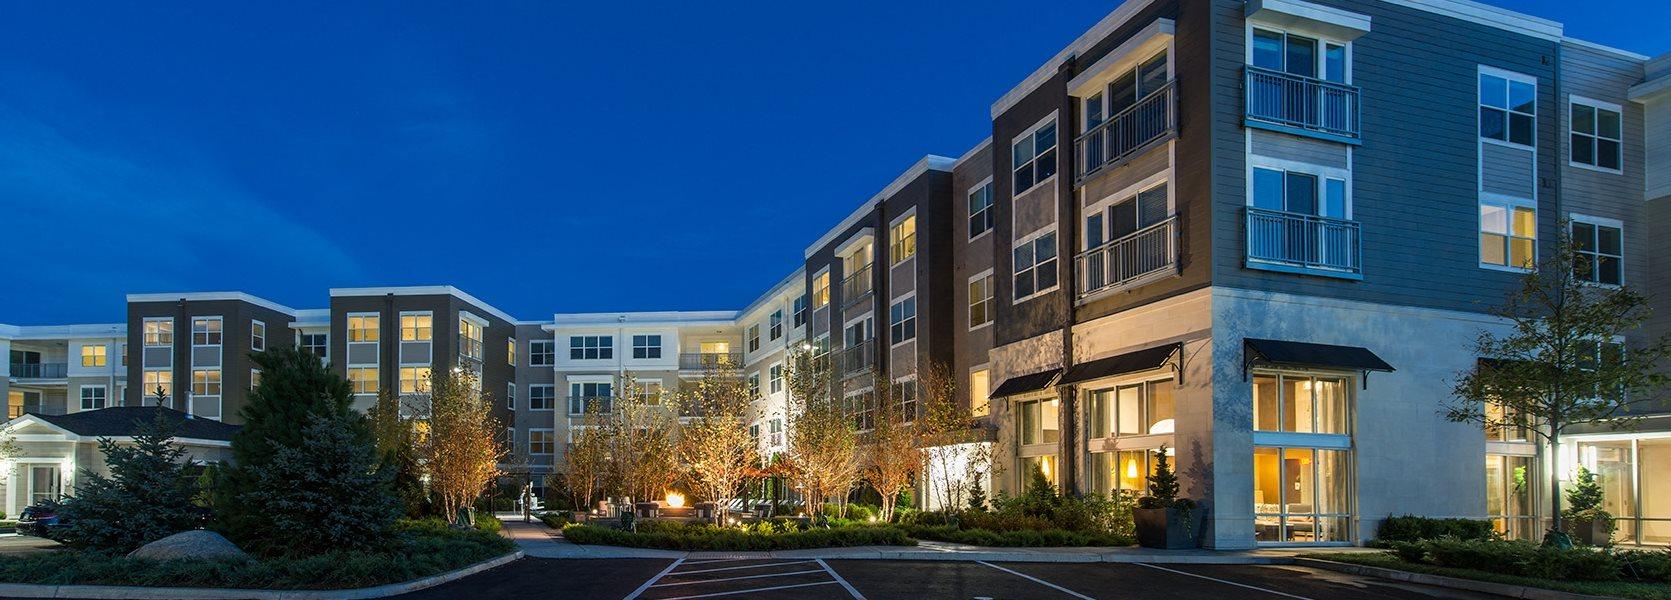 Vinnin Square Apartments